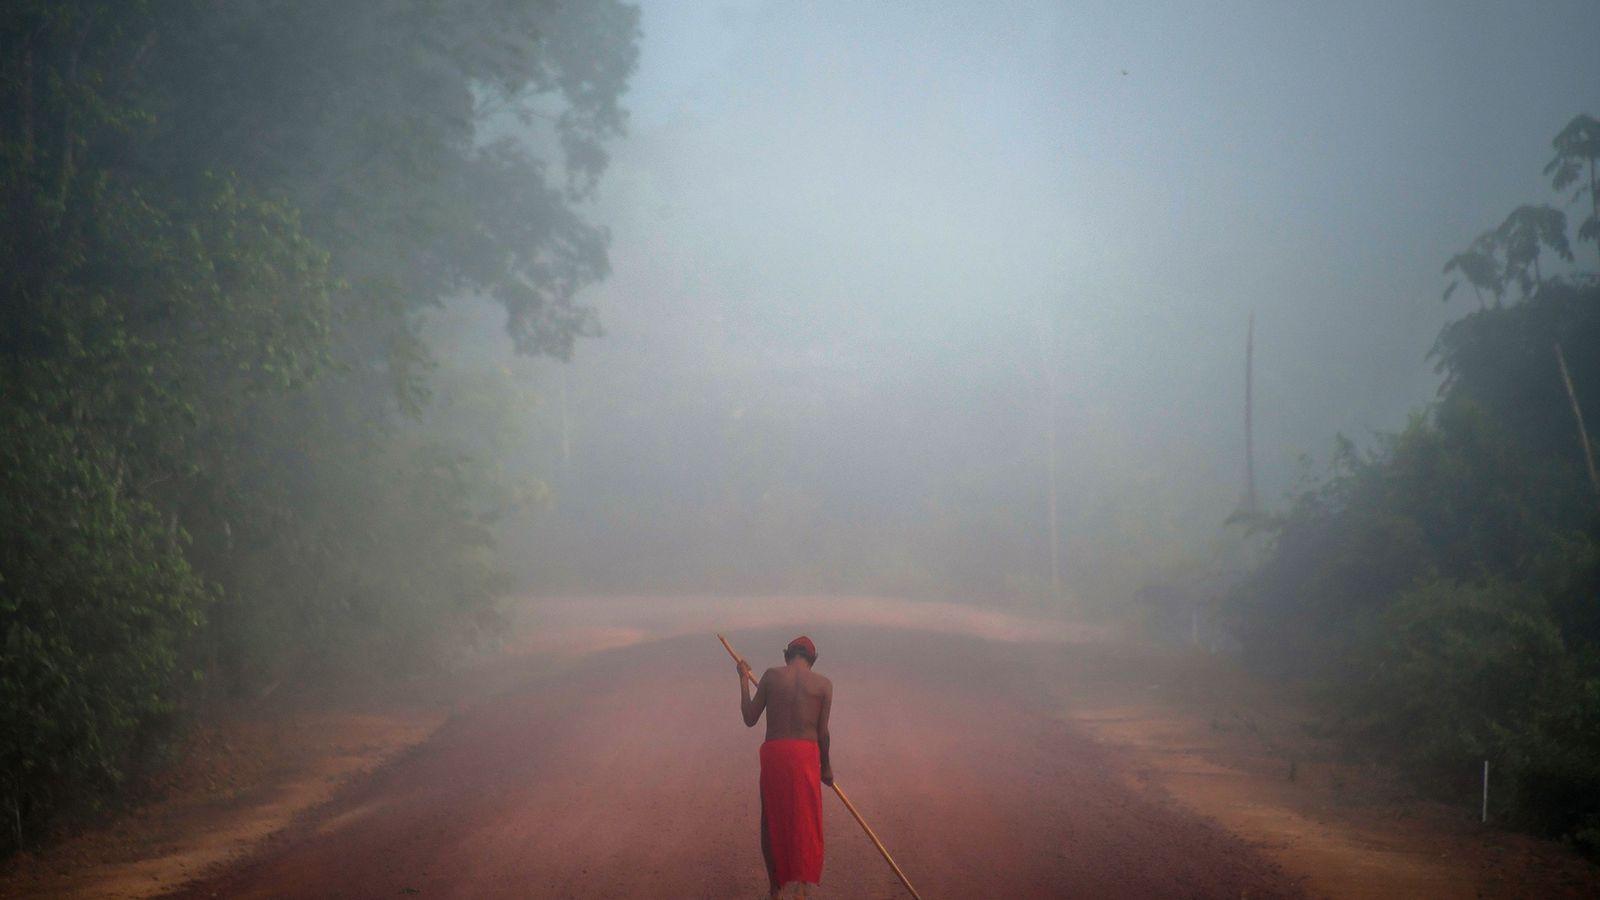 O chefe tribal Tzako Waiapi anda pelo nevoeiro na aldeia Manilha na reserva indígena de Waiapi ...